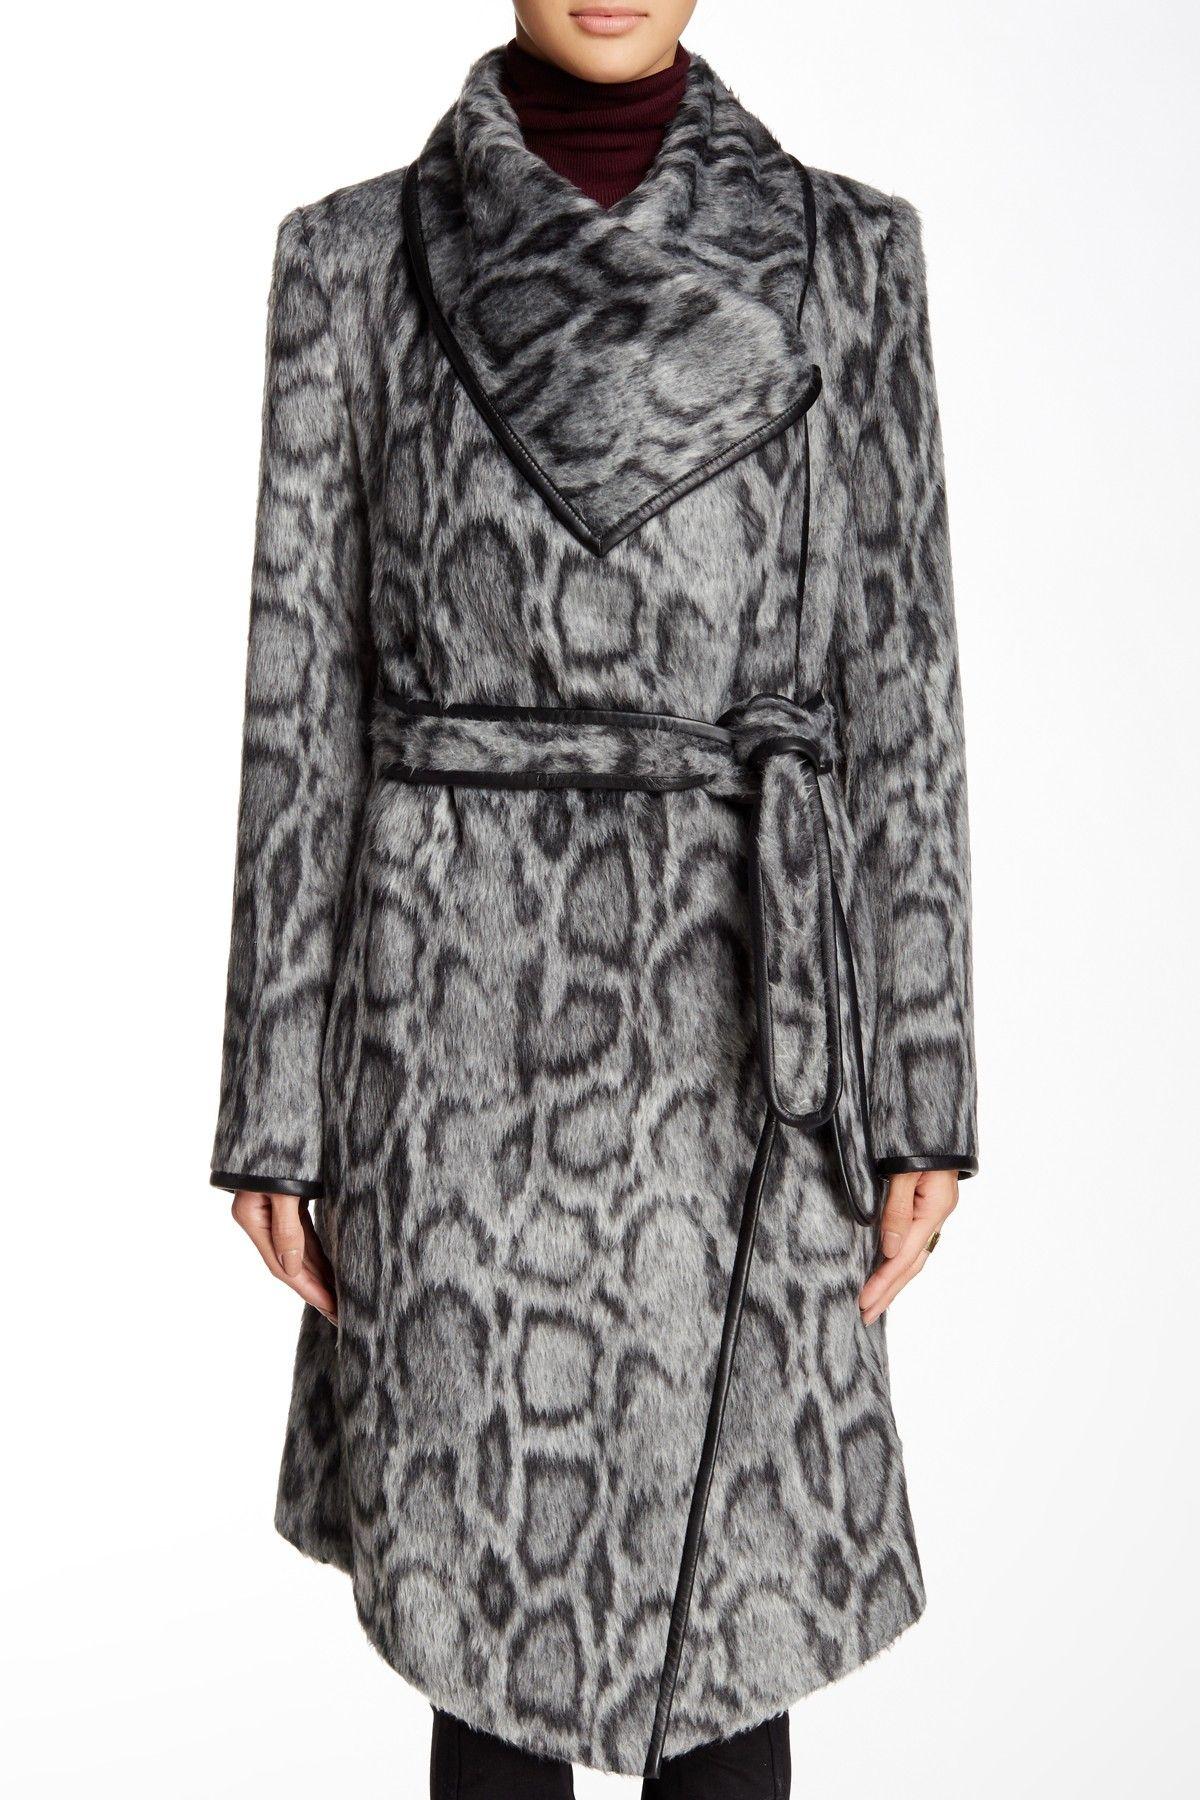 3e74e3918b9d43 Leopard Wrap Coat by Diane von Furstenberg on  nordstrom rack